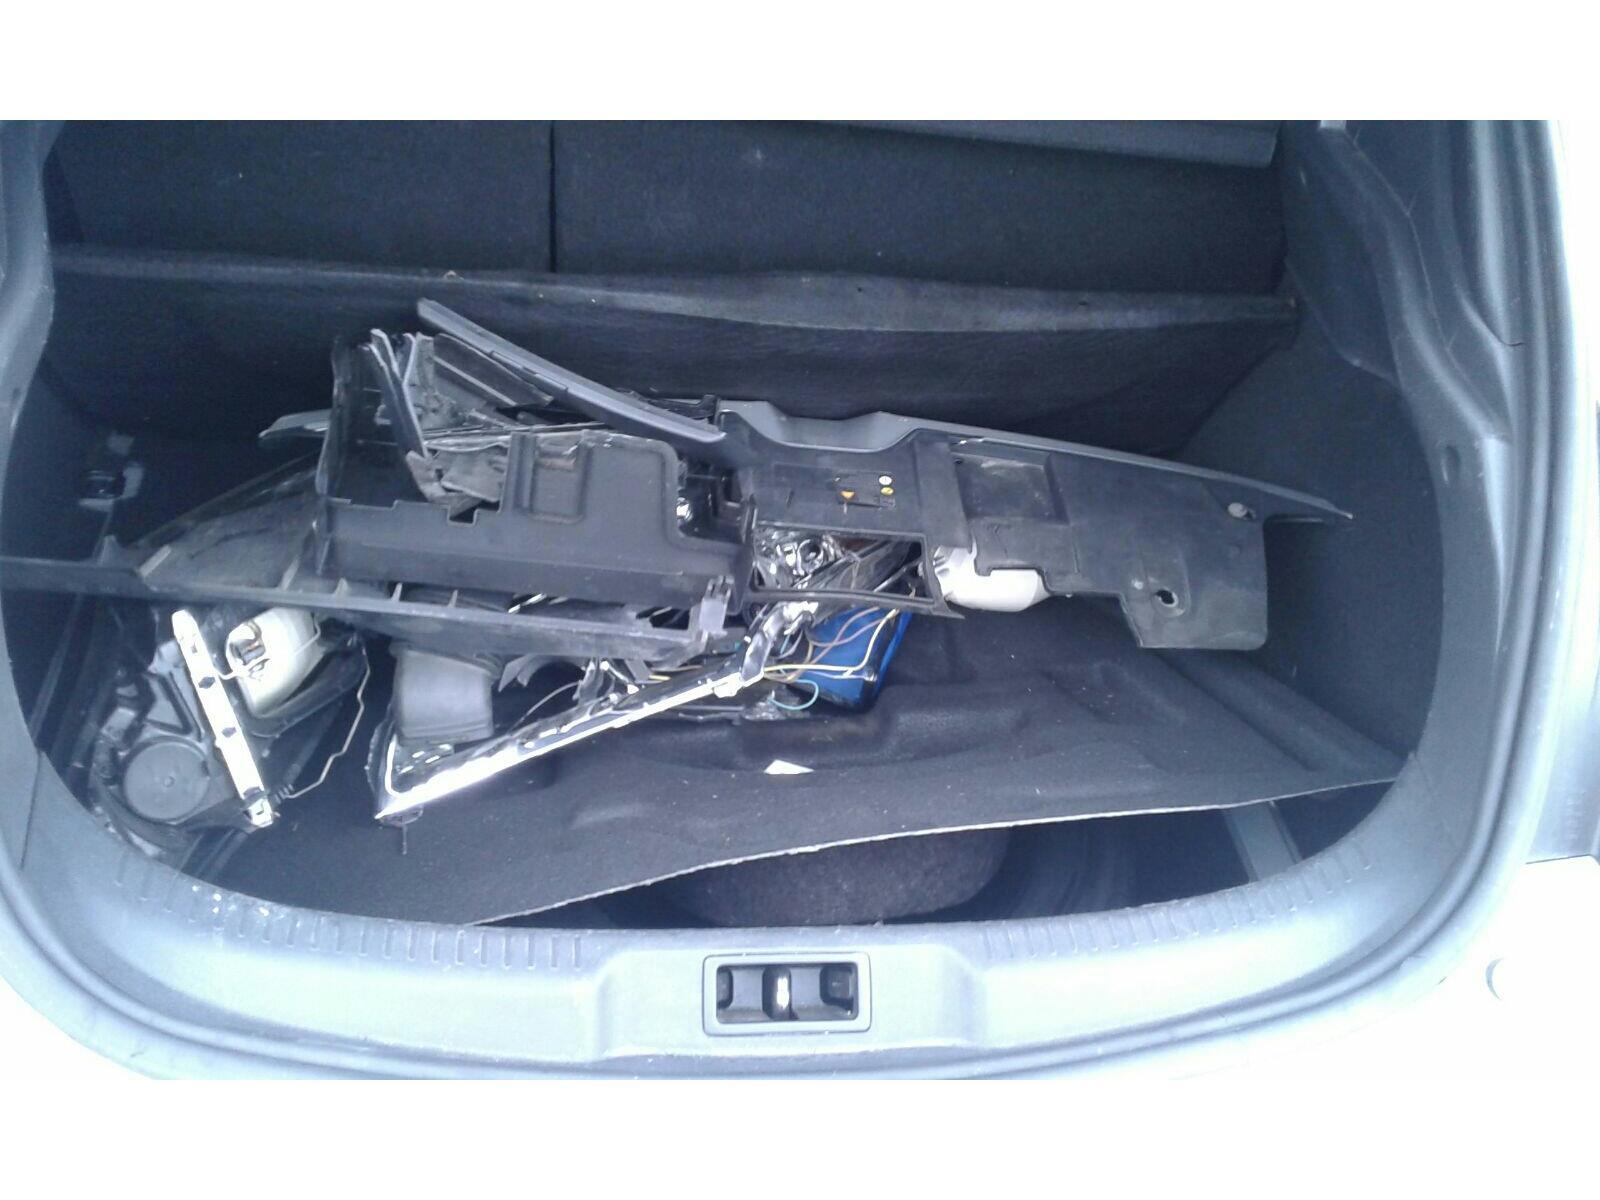 renault megane 2009 to 2012 switch electric window front rh petrol rh motorhog co uk Renault Megane Coupe Renault Megane Coupe